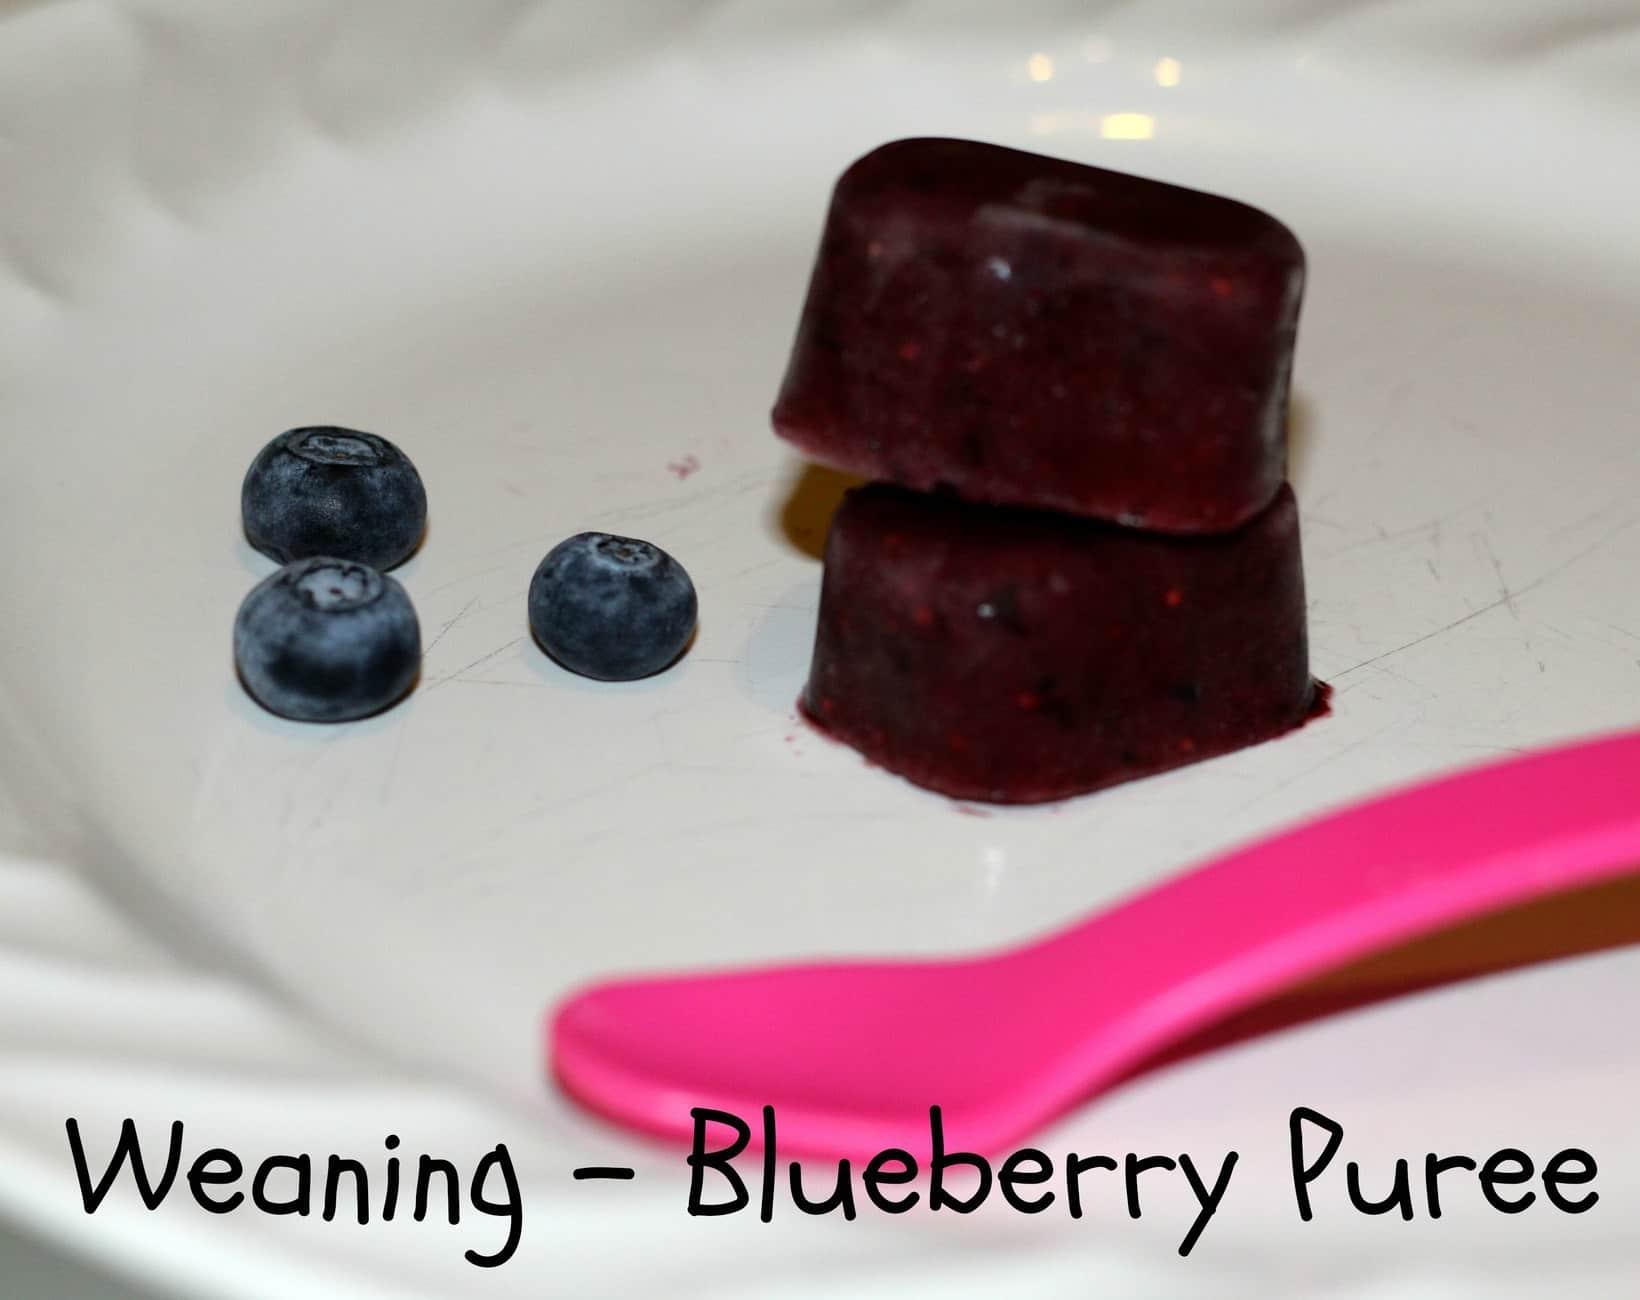 blueberry puree